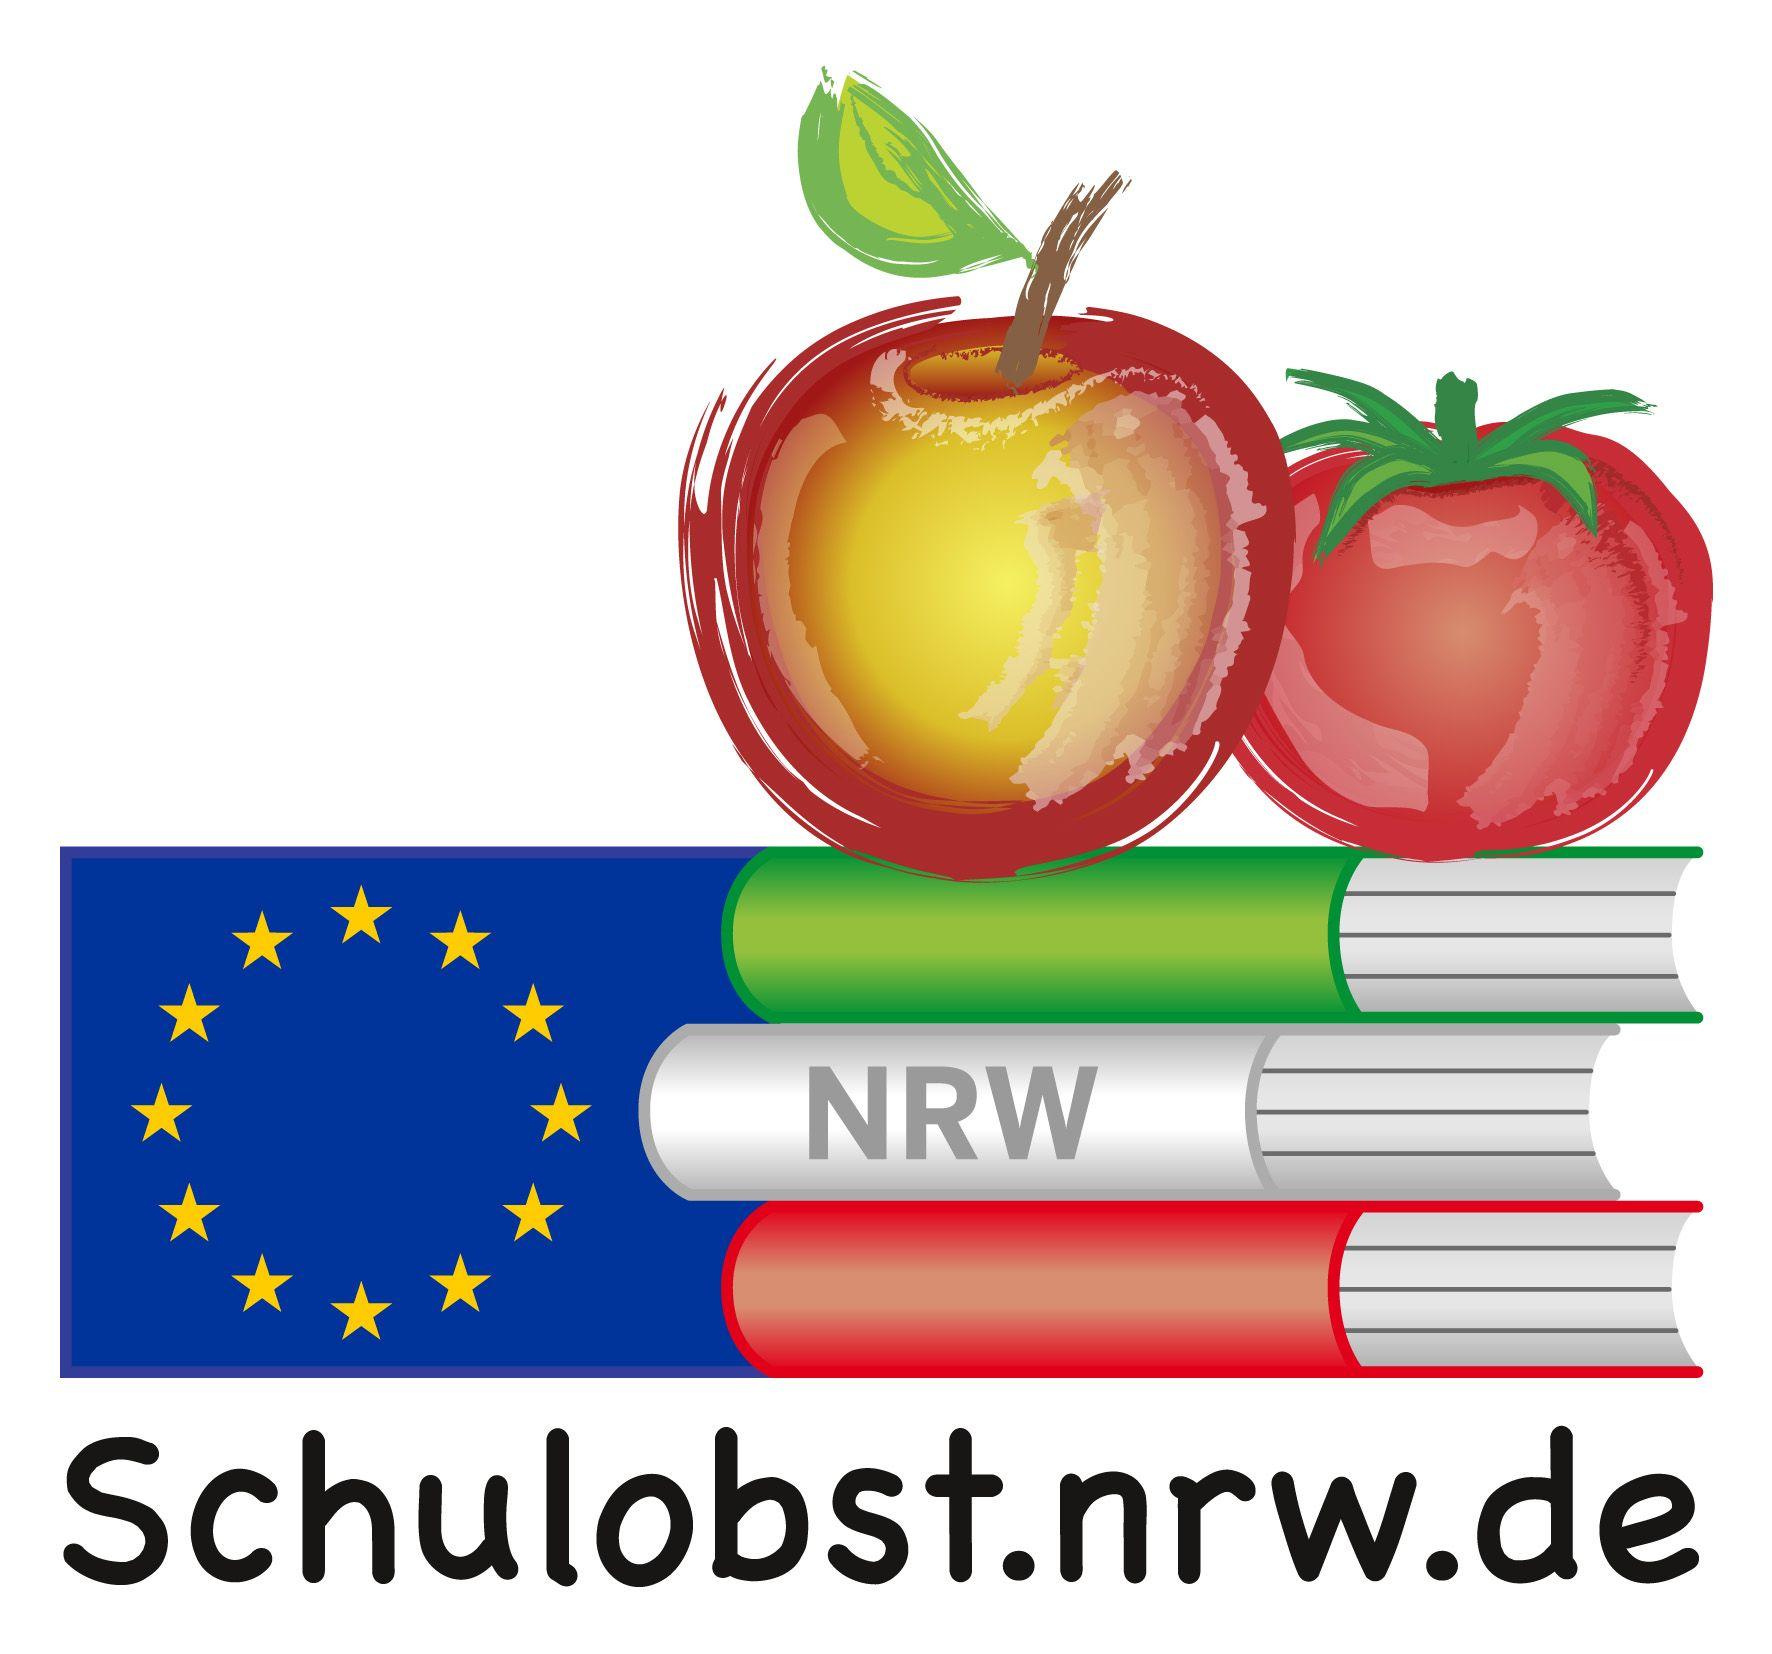 logo-schulobst-nrw-gross.jpg